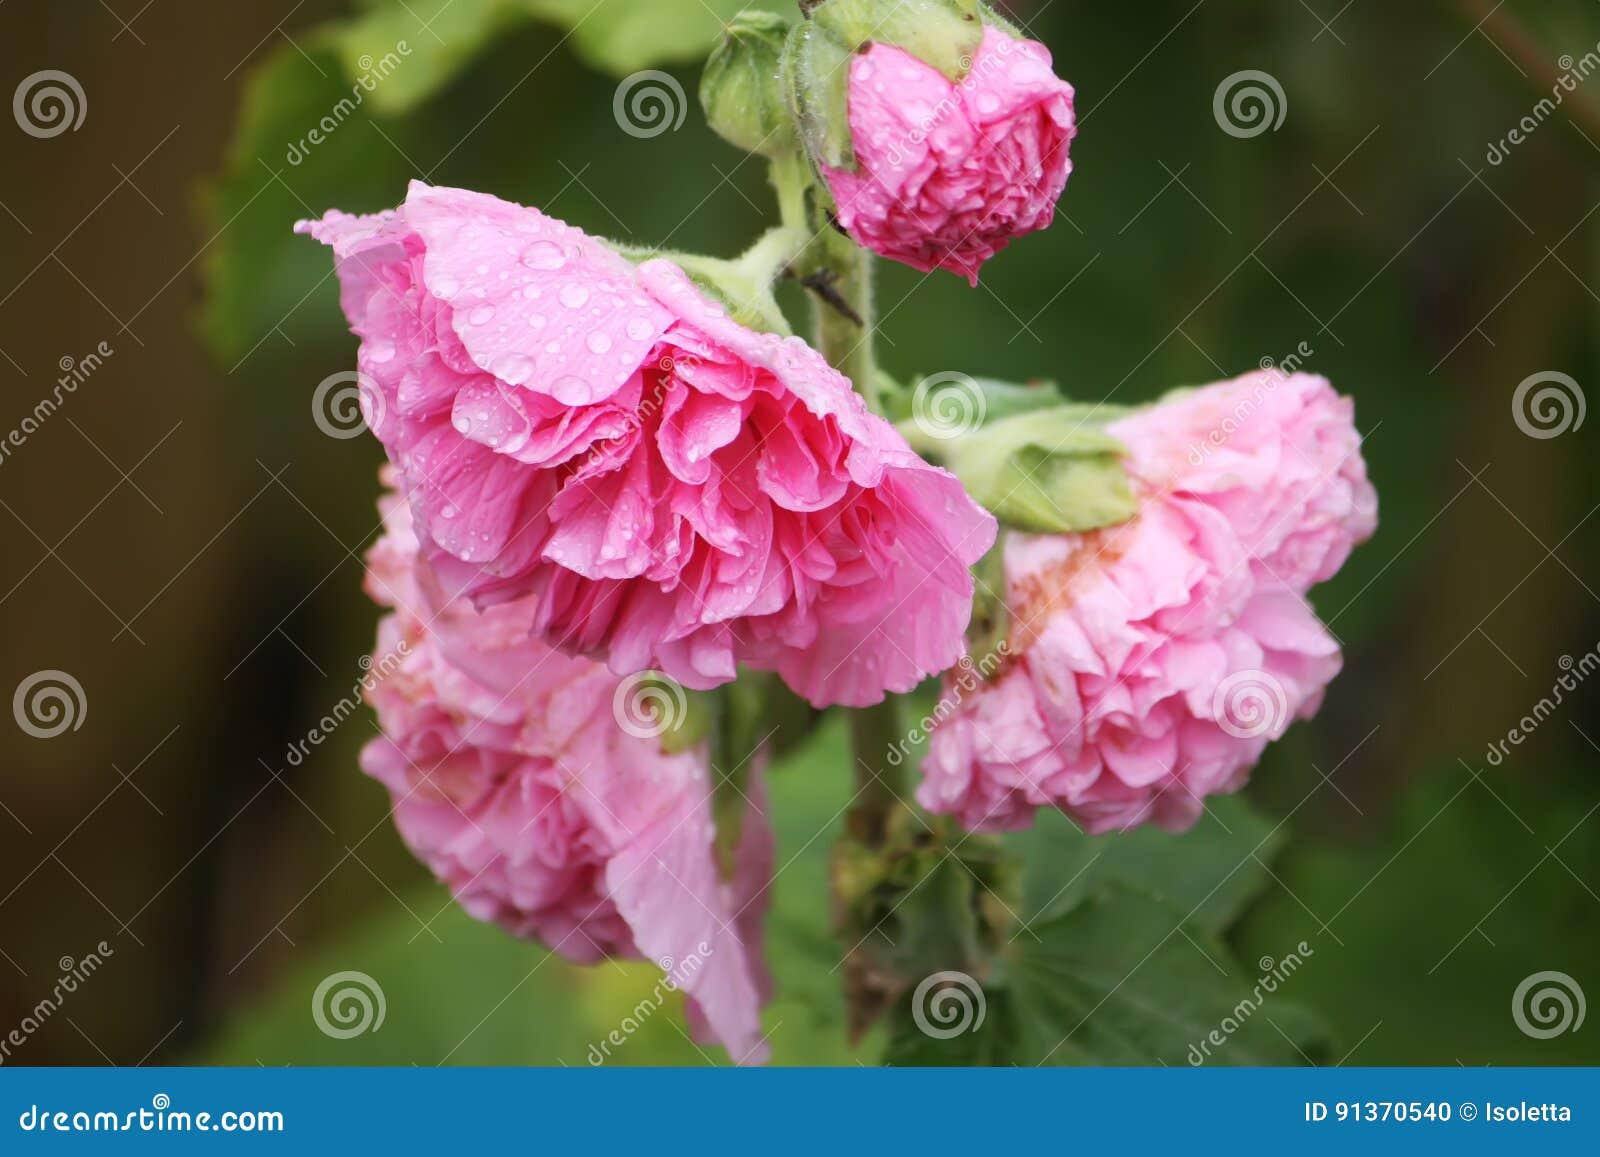 Rosa malvaväxter